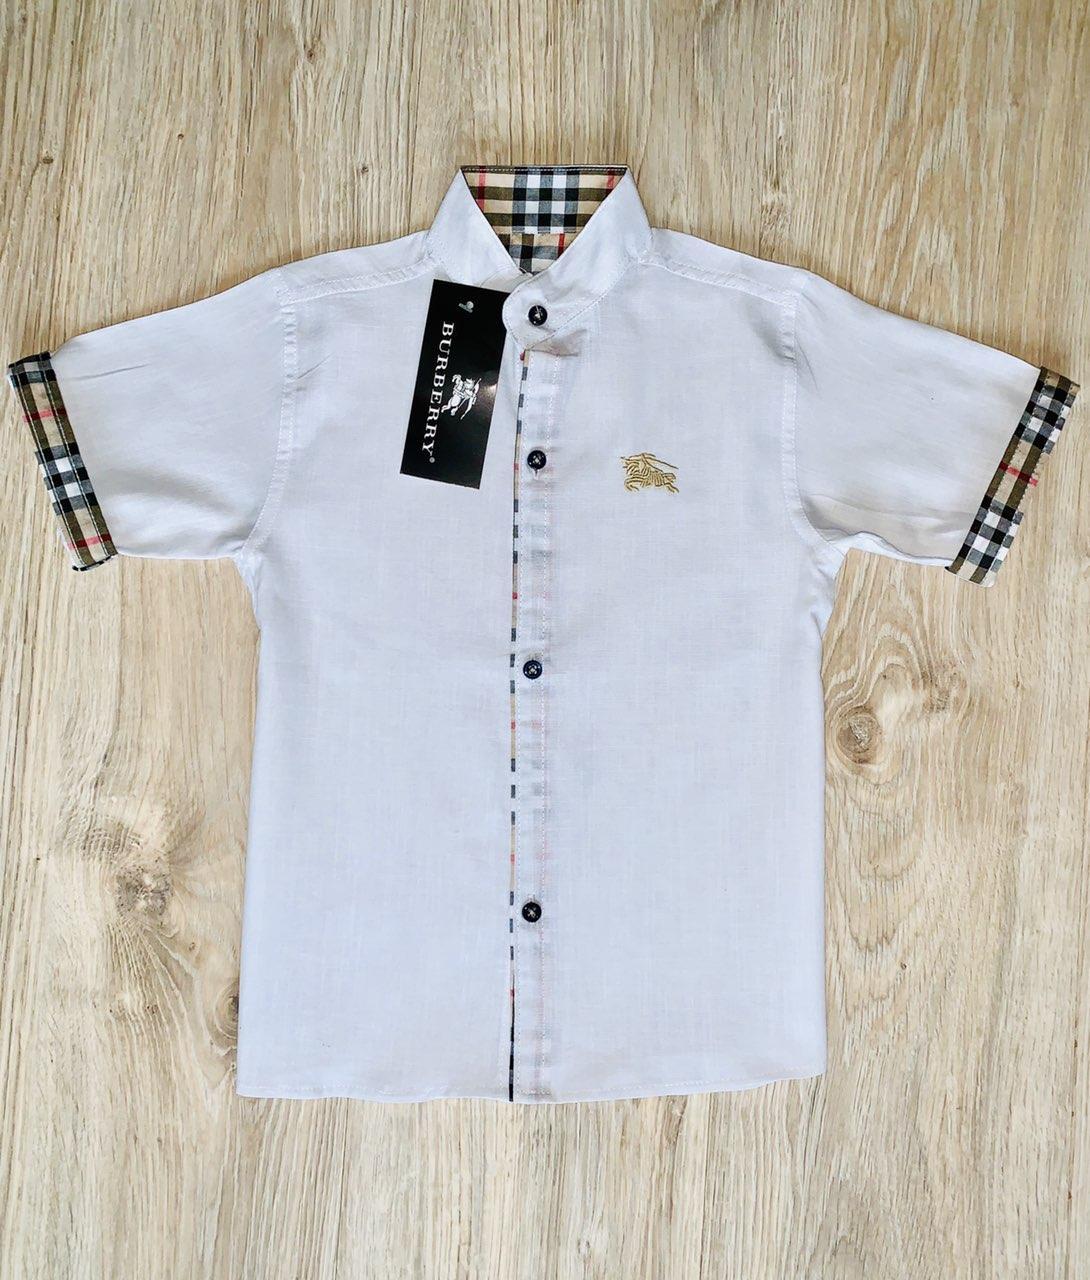 Рубашка белая Burberry с коротким рукавом для мальчика